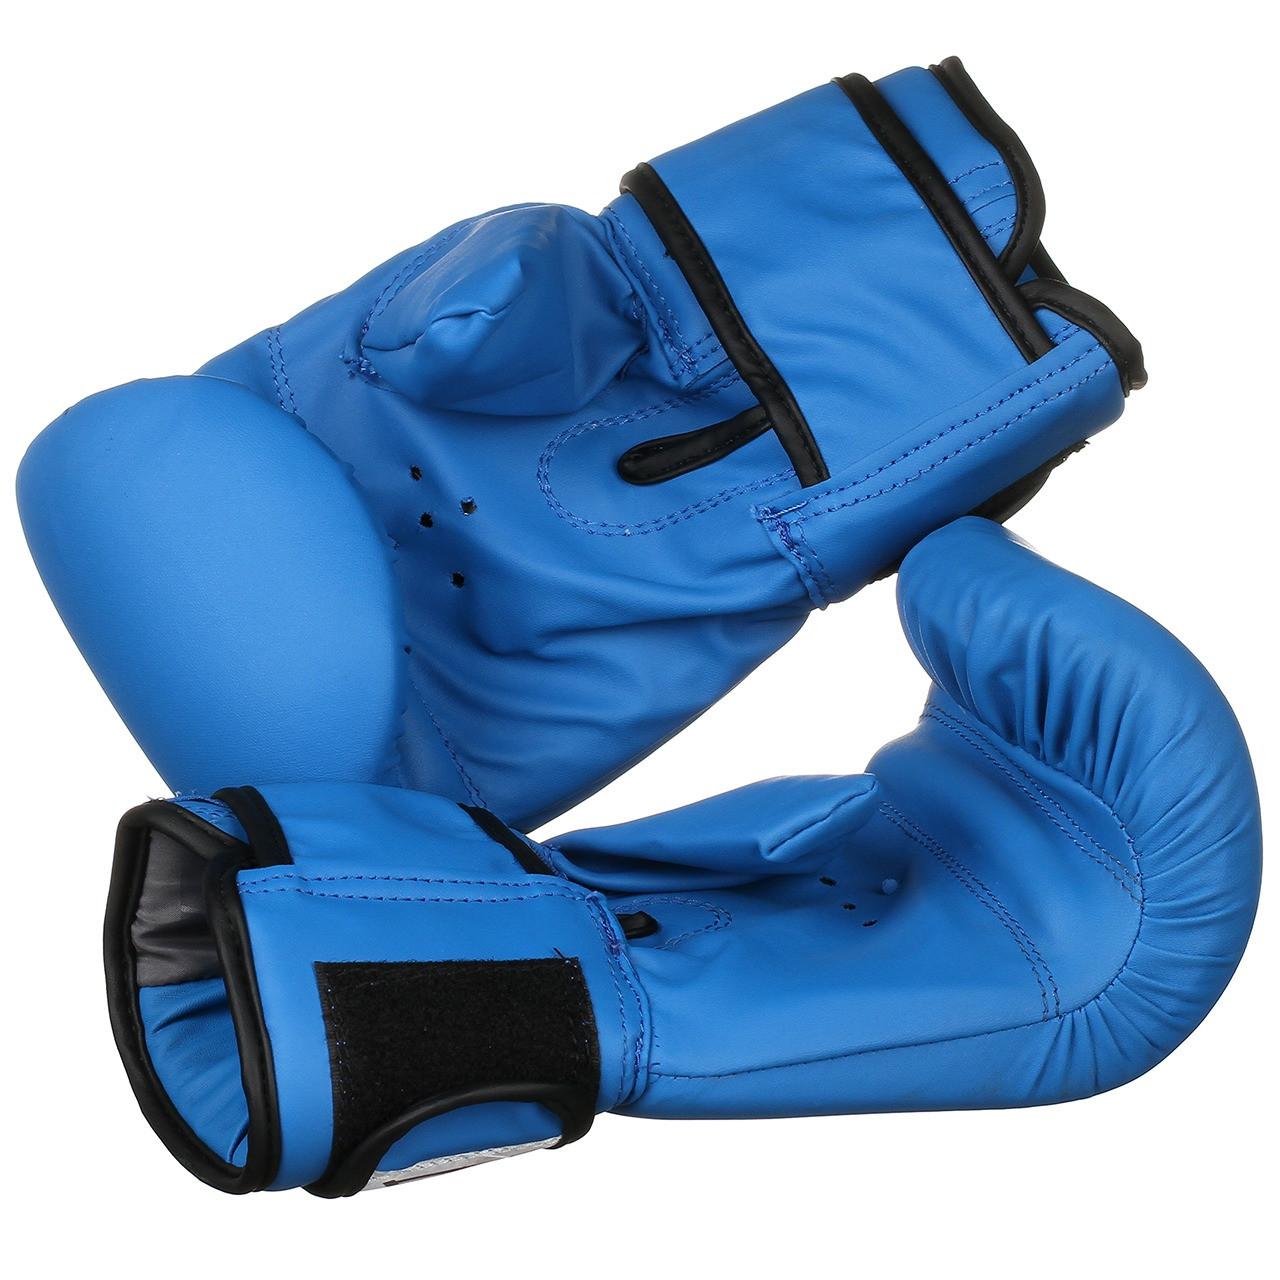 Боксерские перчатки для бокса EVERLAST размер L (боксерські рукавички для боксу)